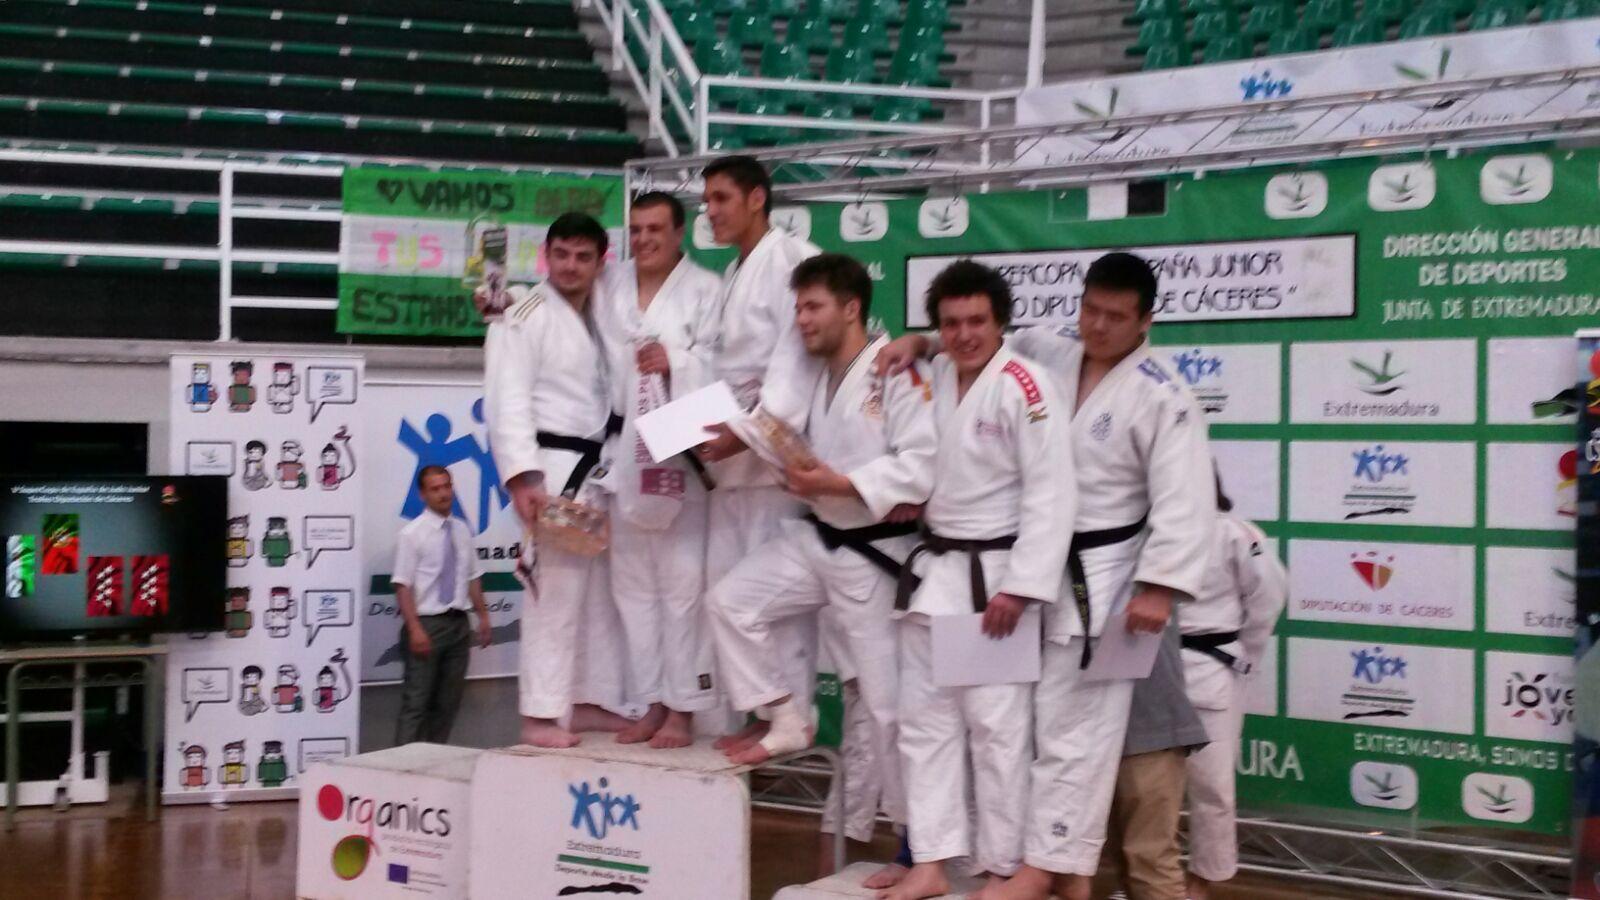 Supercopa de España de Judo Junior en Cáceres 2016